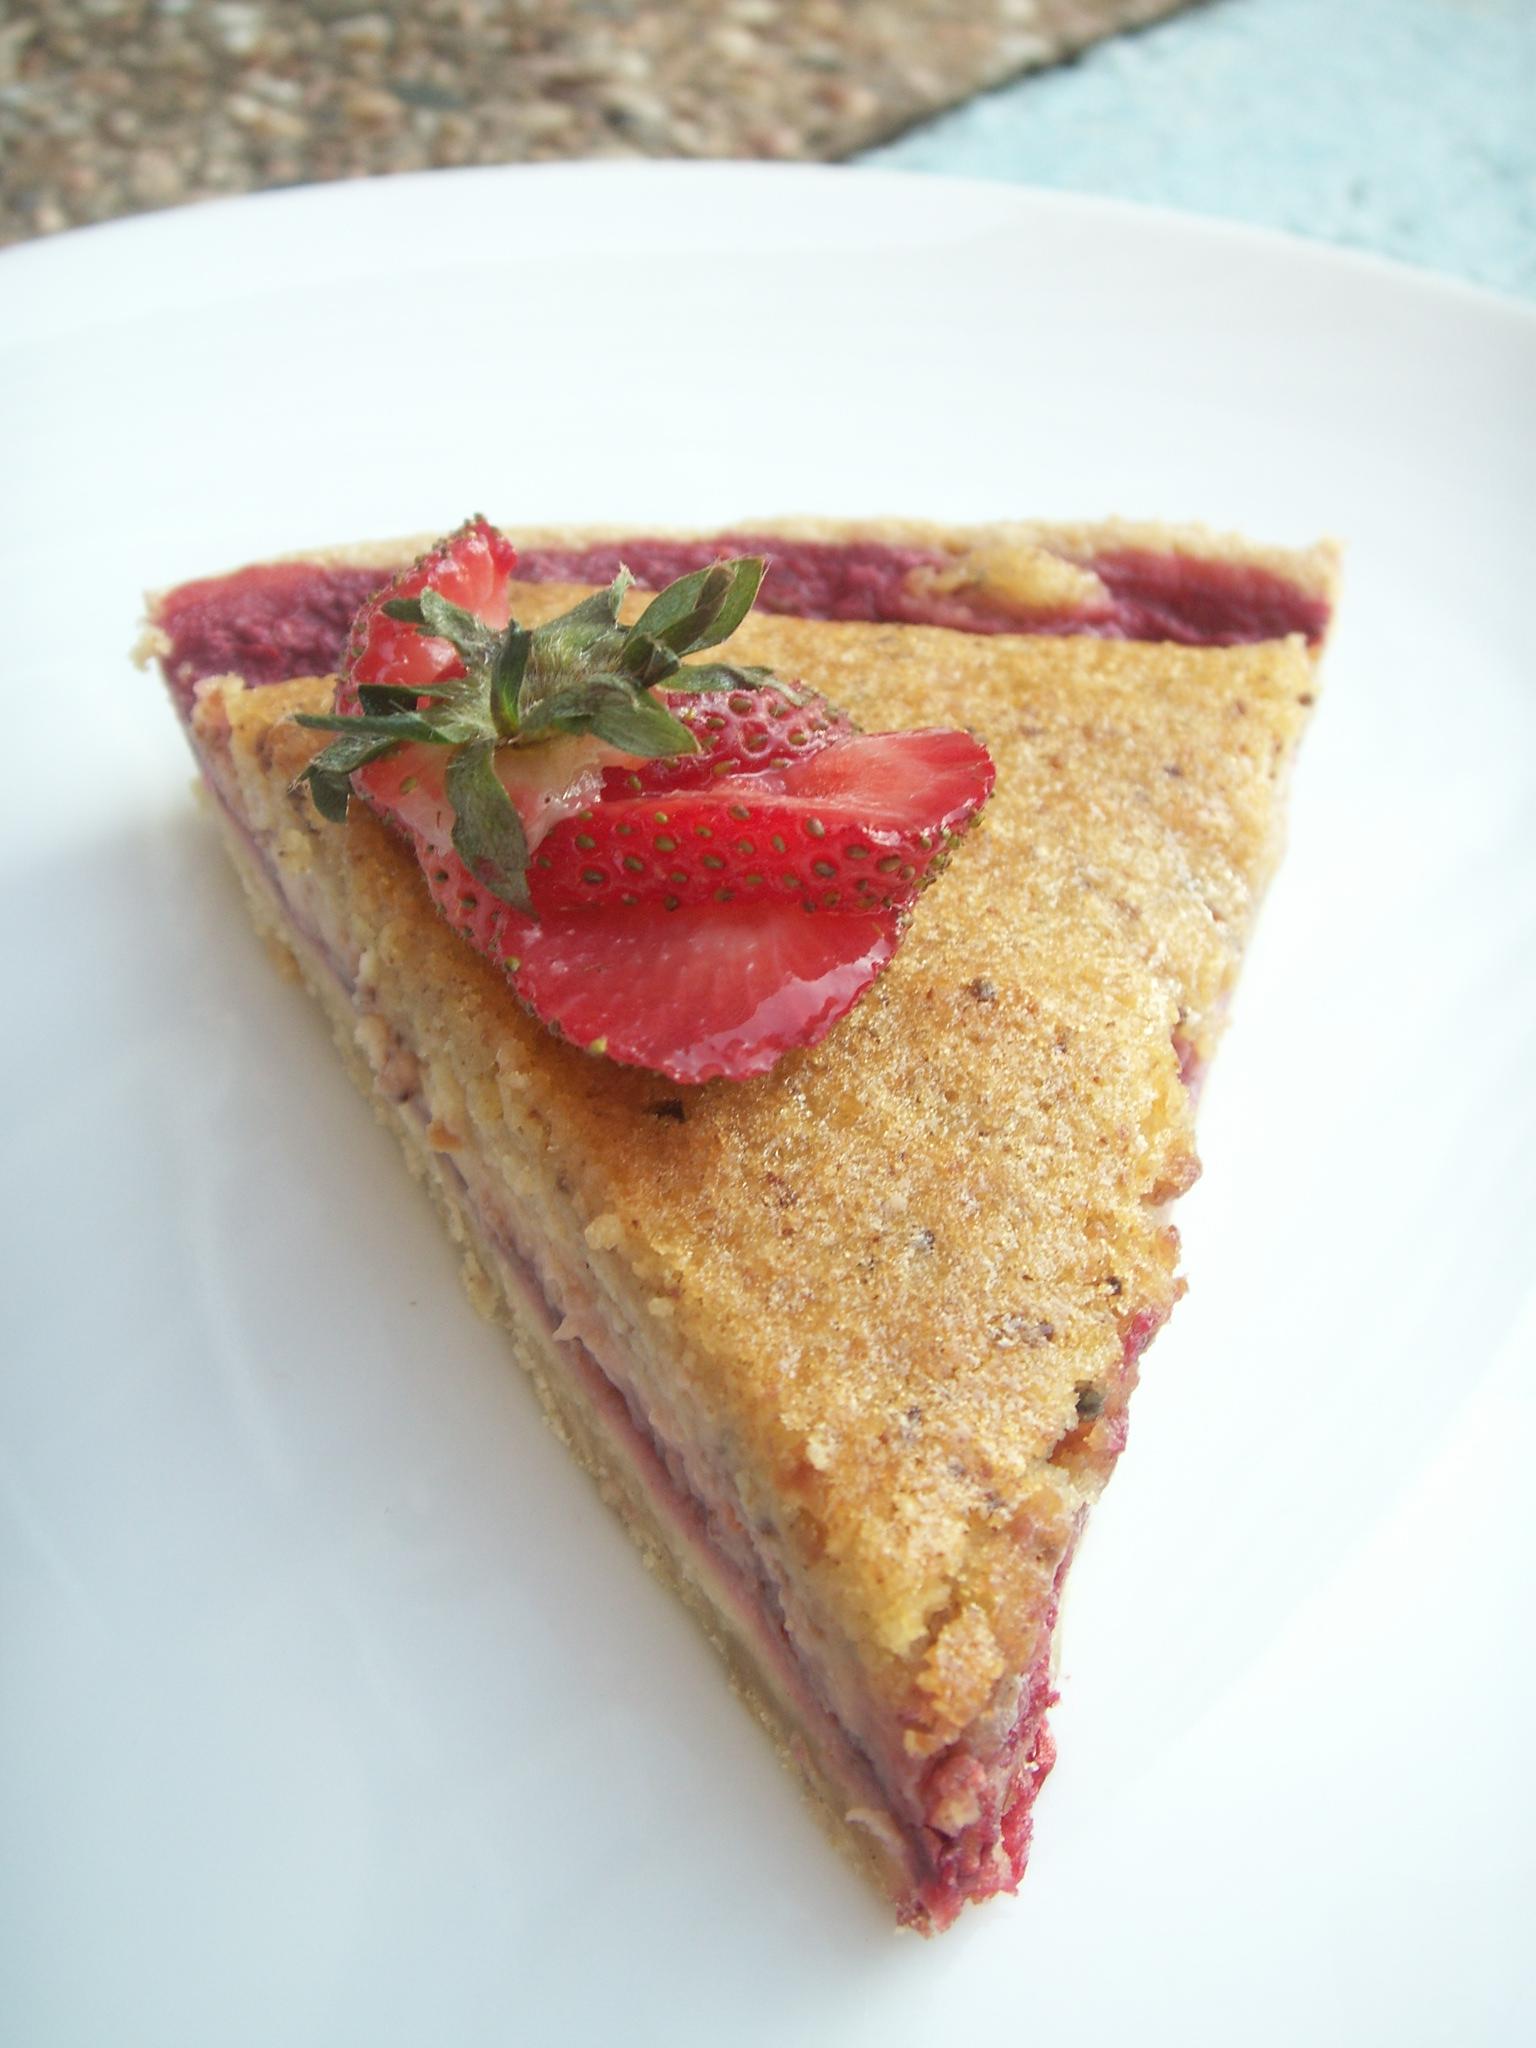 Raspberry-Strawberry & Almond Tarte